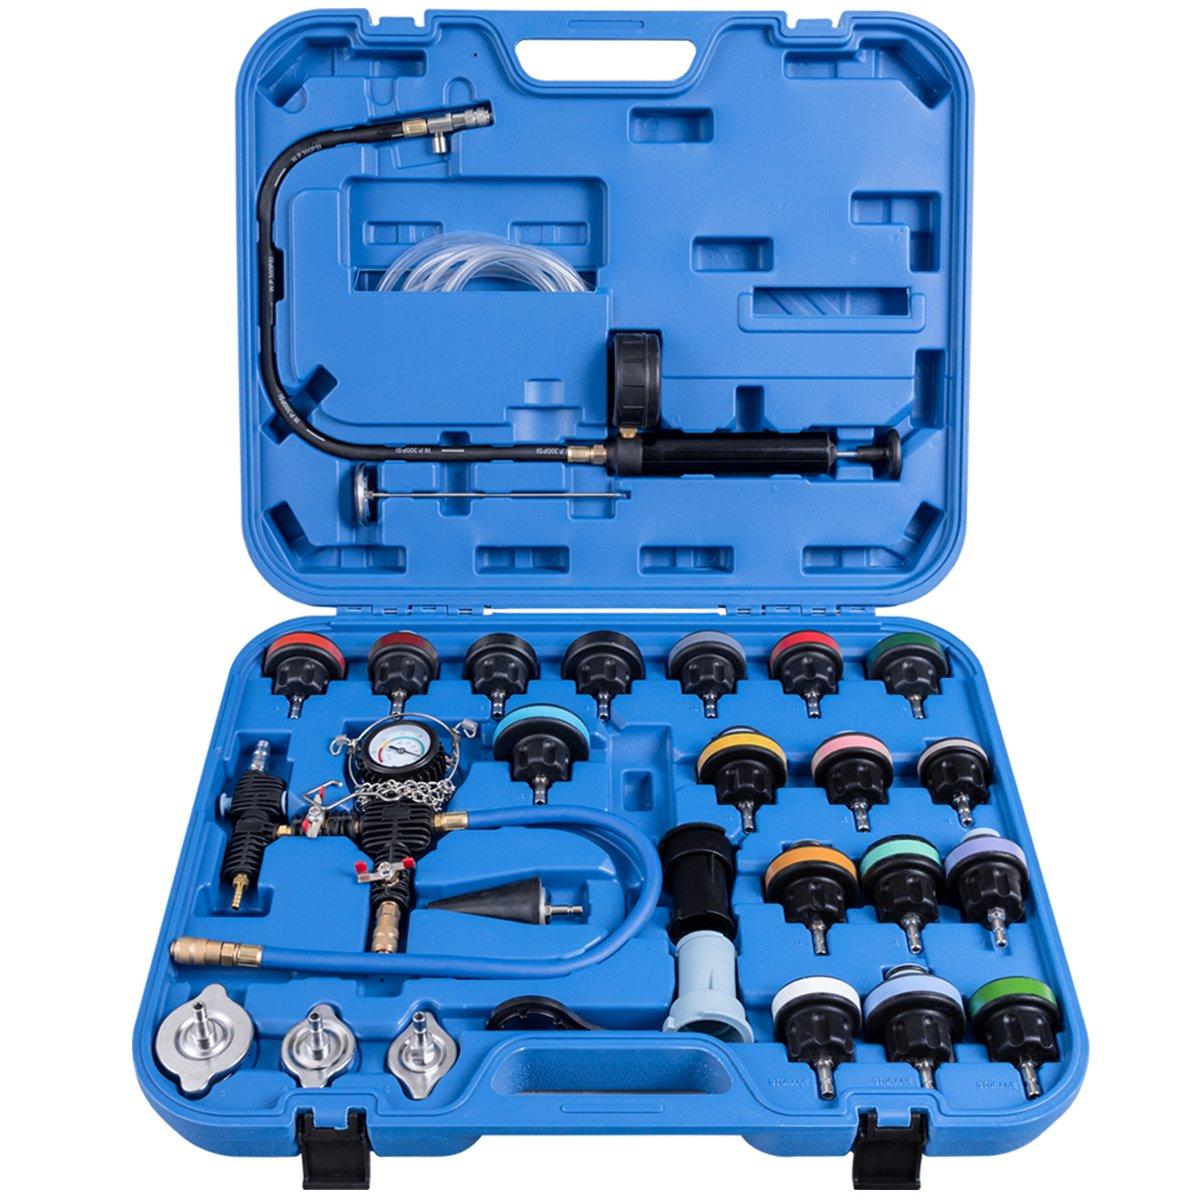 Goplus 28PCS Universal Radiator Pressure Tester Leak Checker Vacuum Type Cooling System Automotive Radiator Pressure Test Kit Purge and Refill Kit Set w/Carrying Case by Goplus (Image #2)